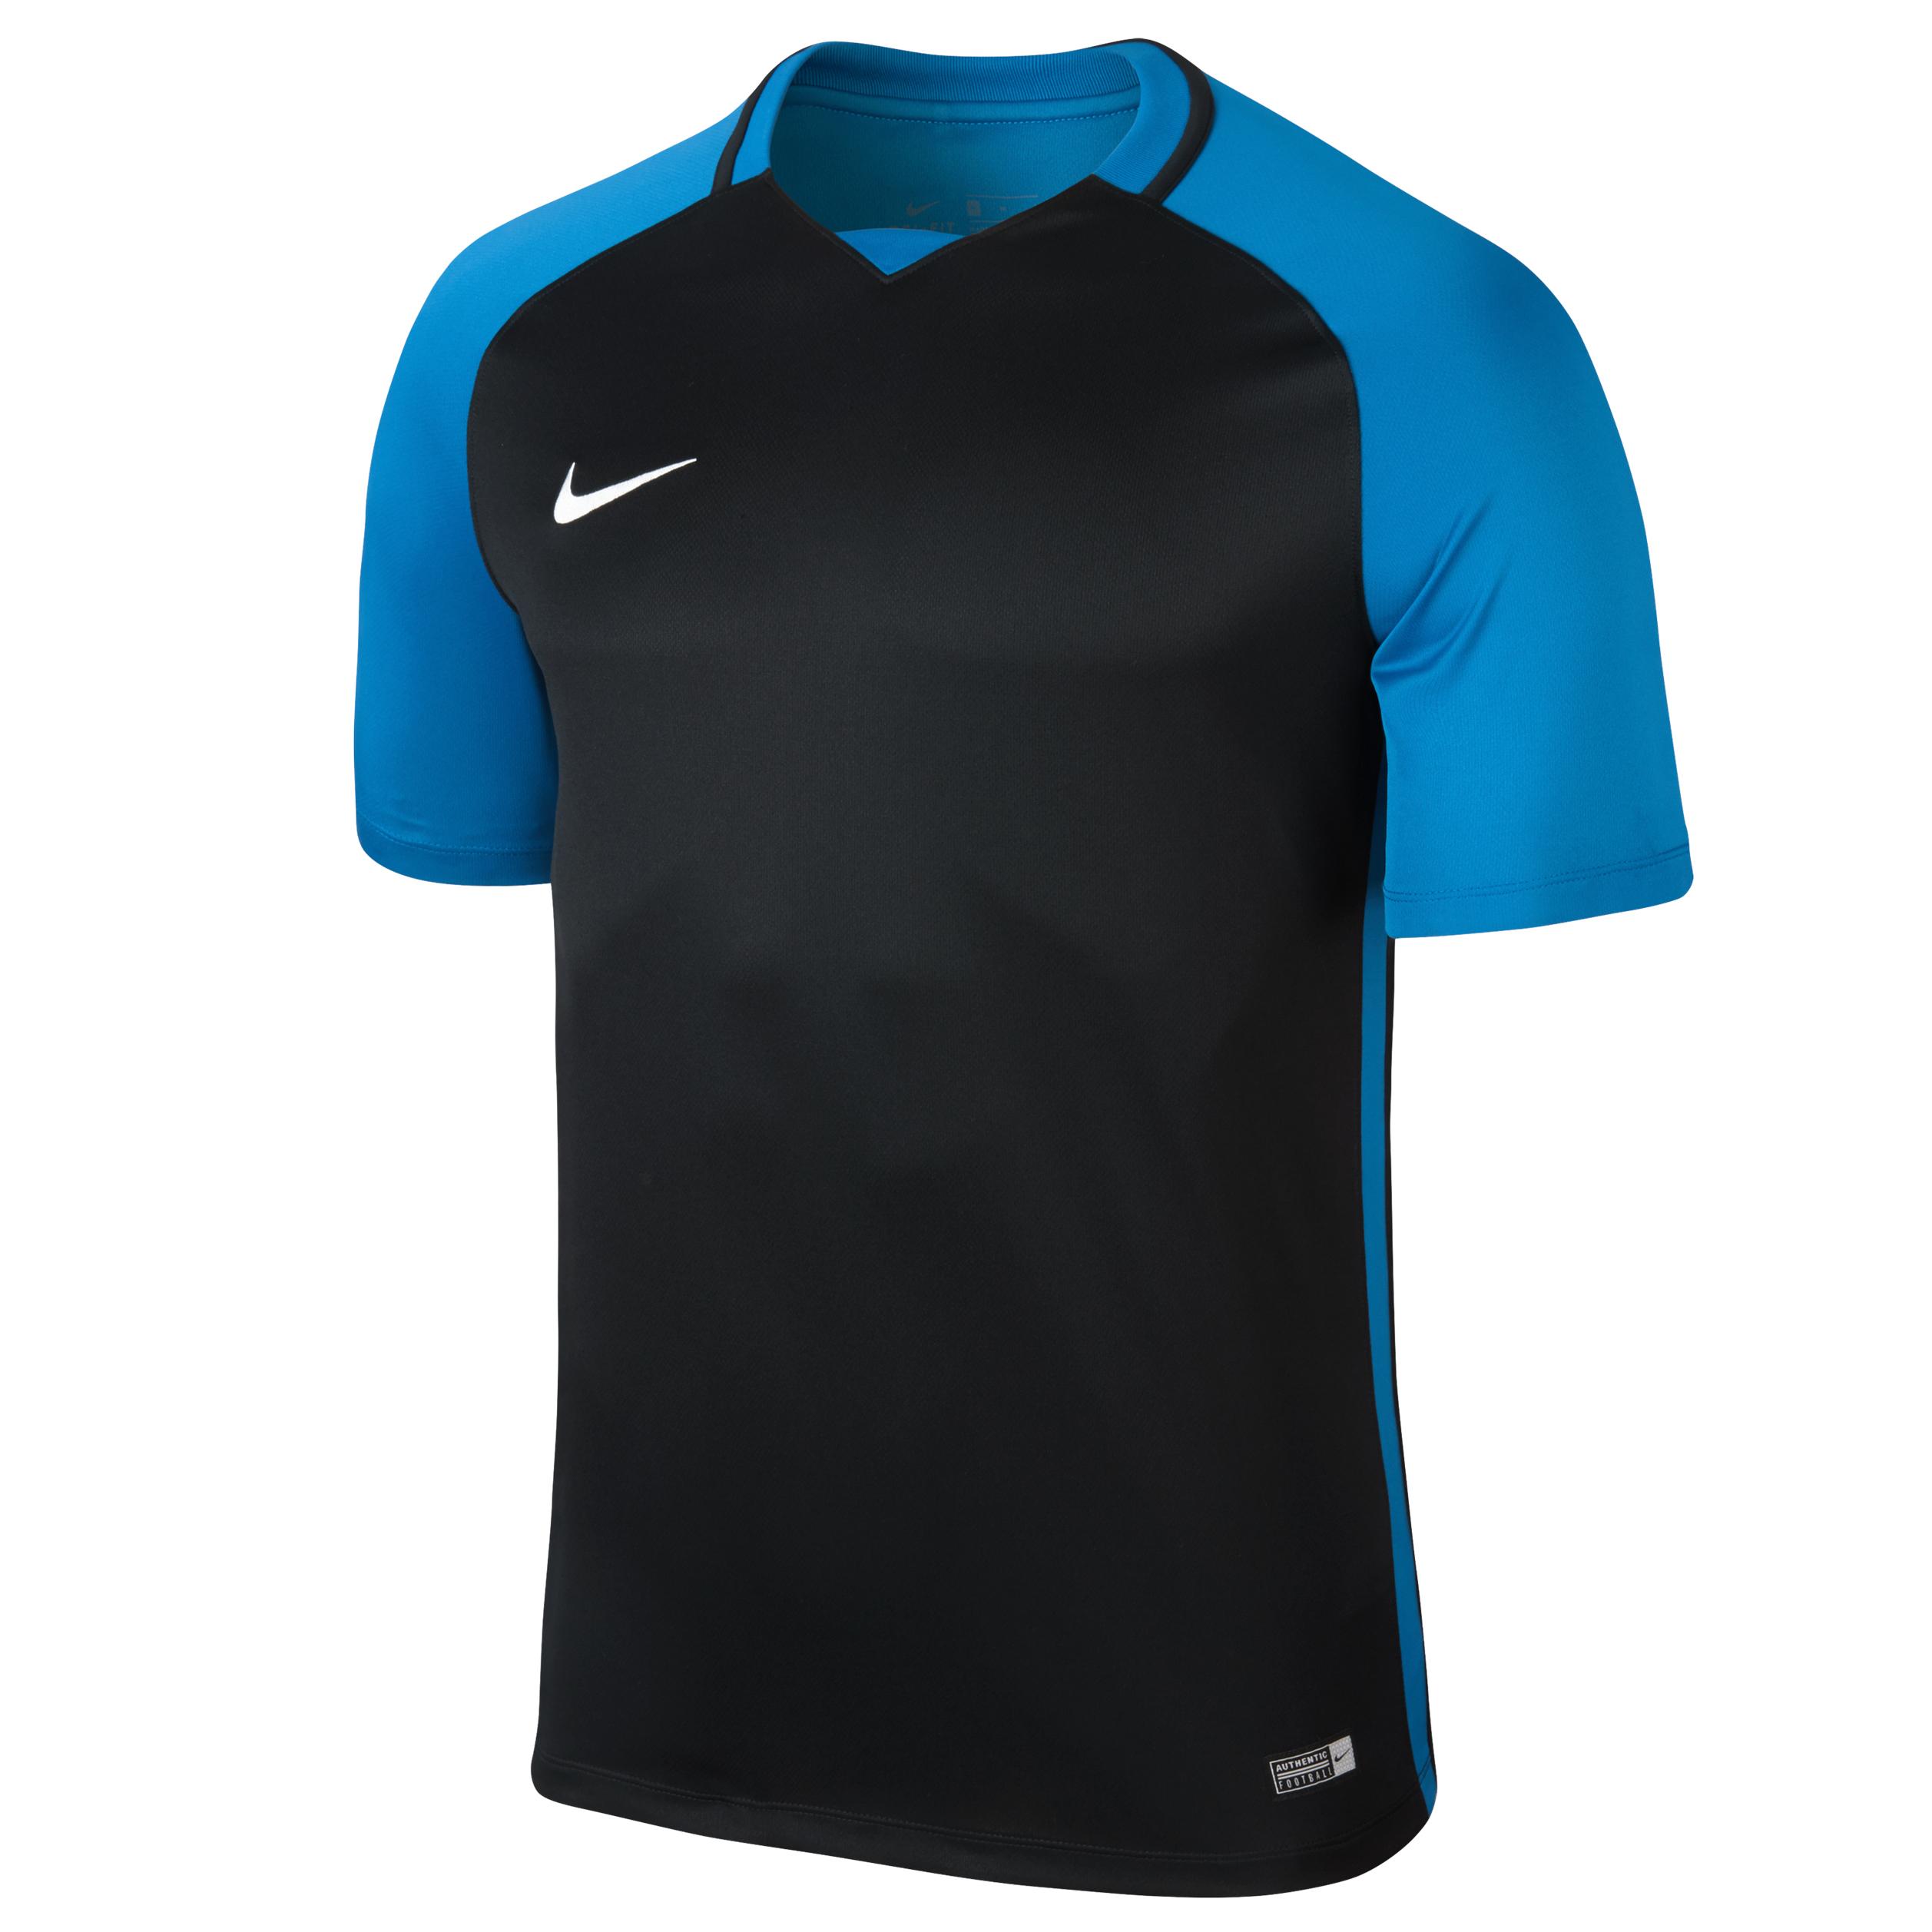 Nike Trophy III Short Sleeve Shirt Midnight Navy Lt Photo Blue • RJM Sports 590cddc98b63